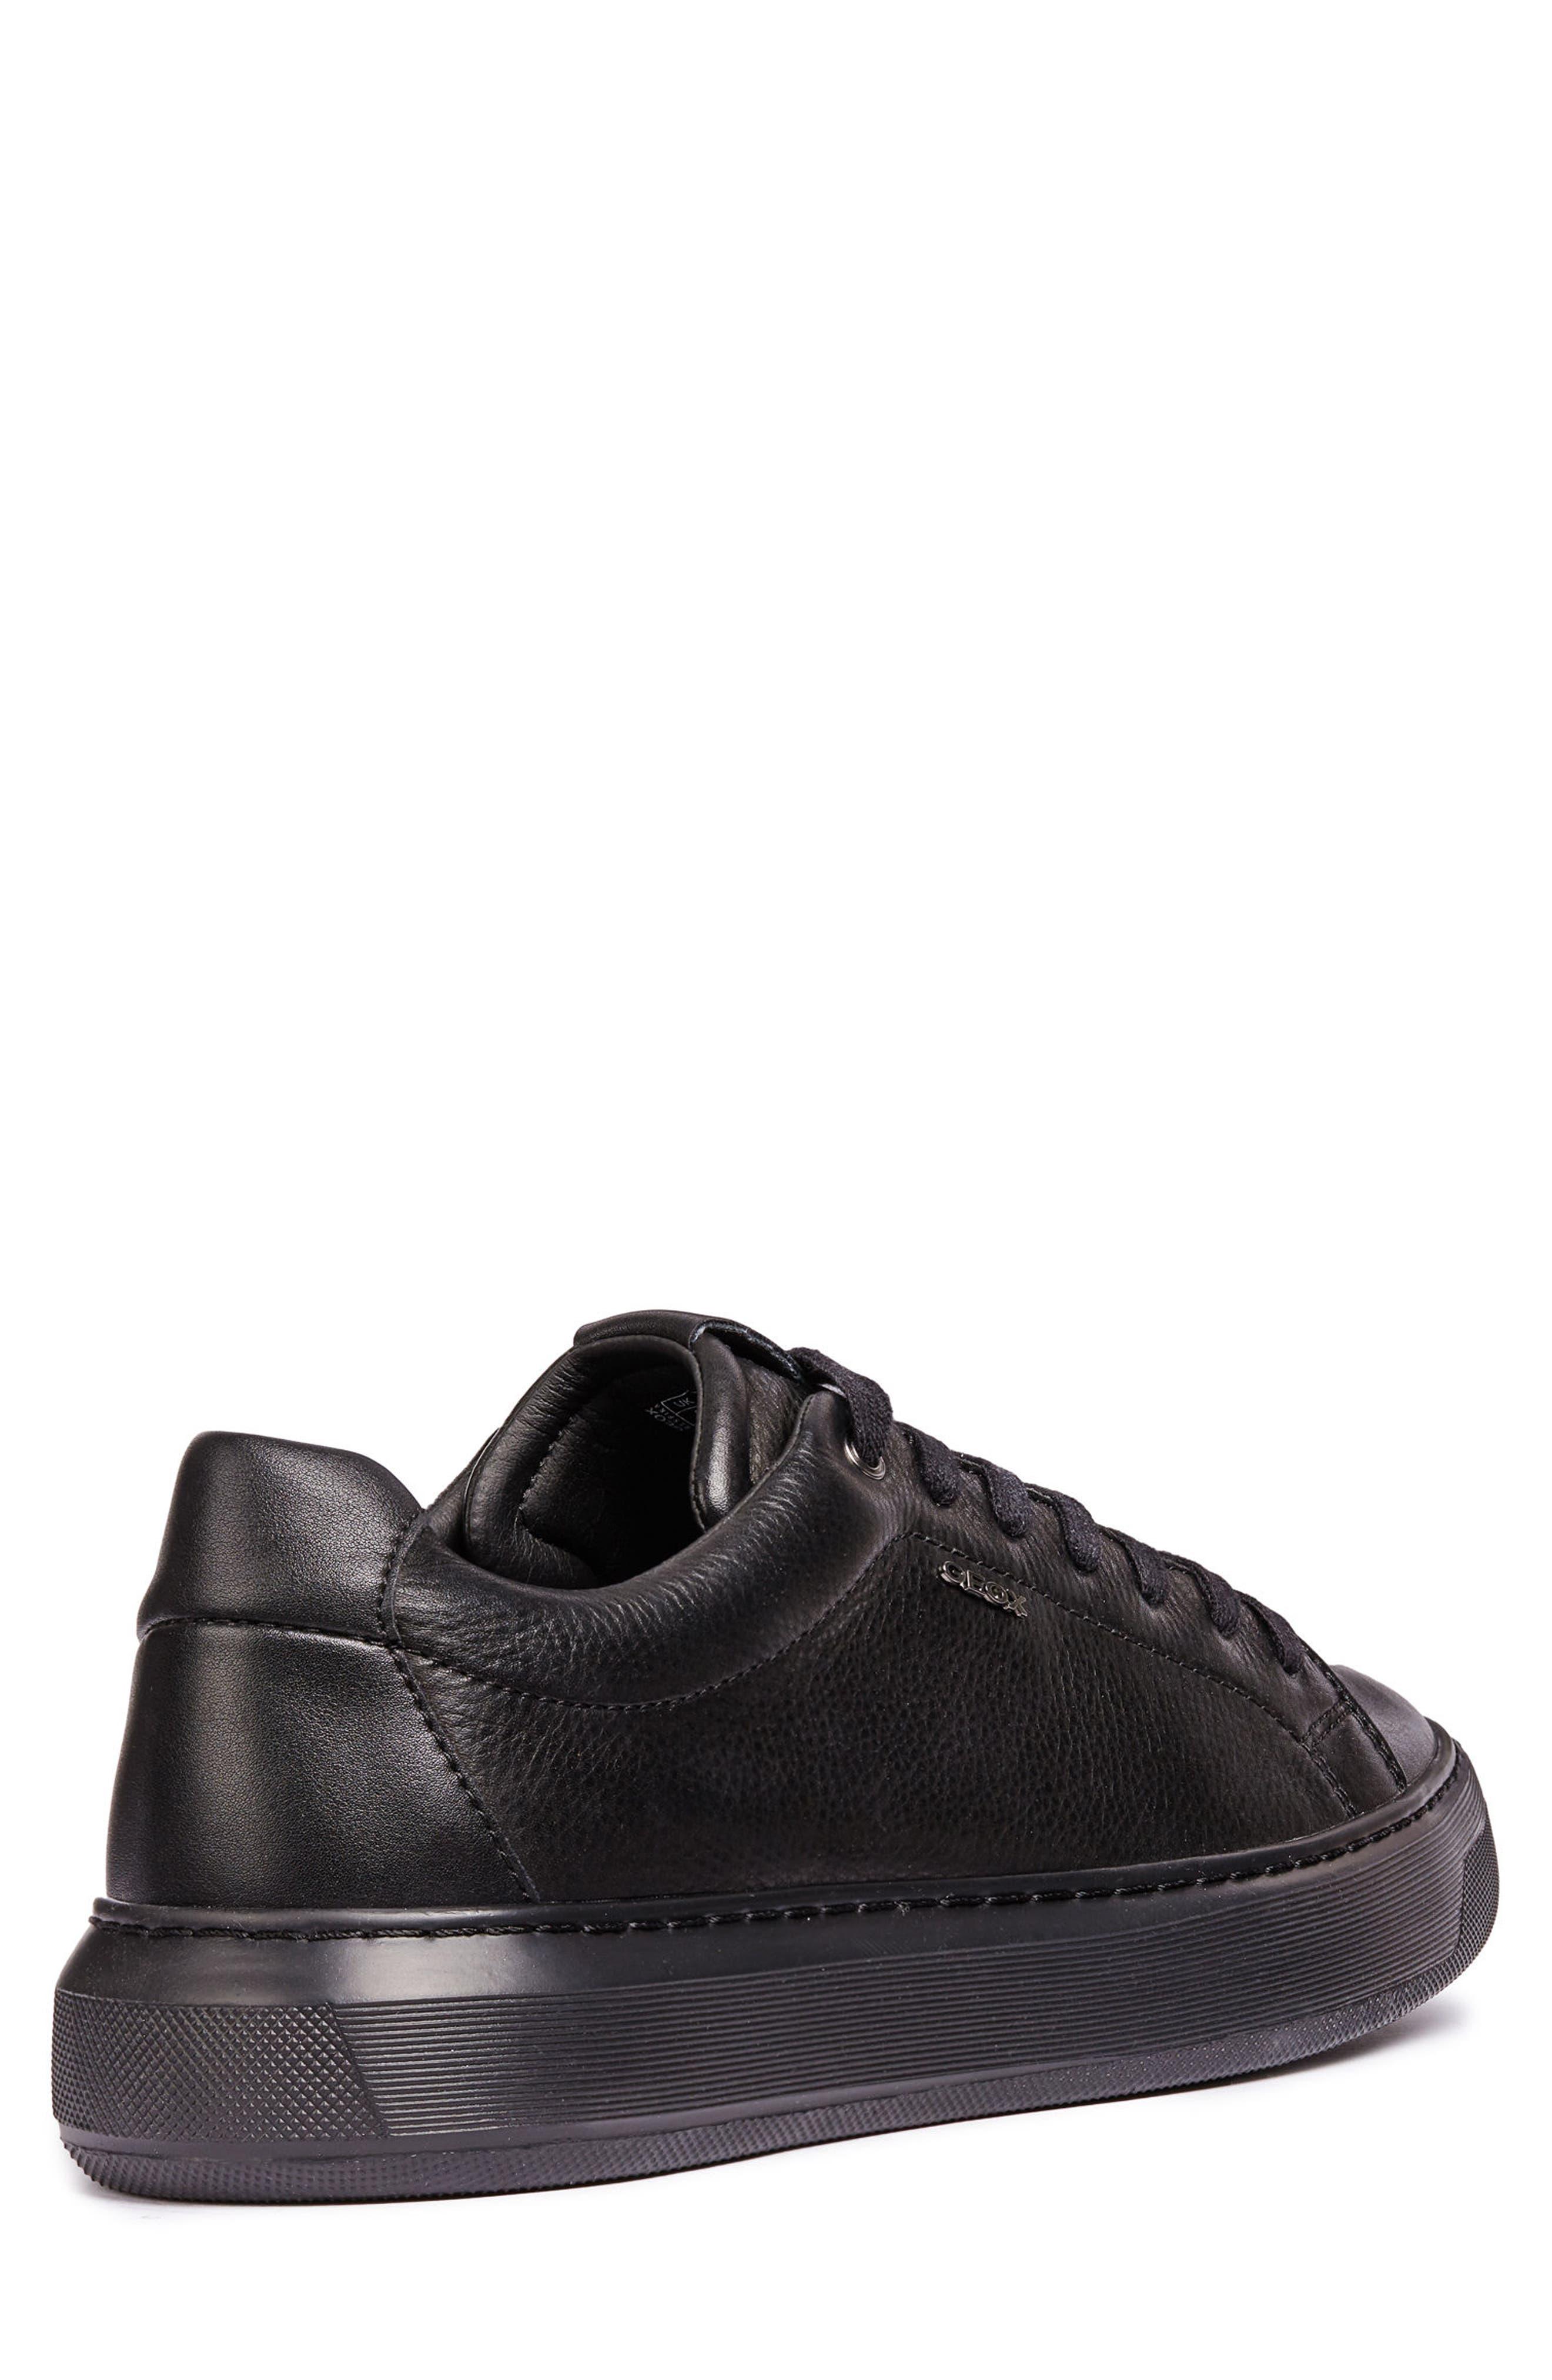 Deiven 4 Low Top Sneaker,                             Alternate thumbnail 2, color,                             BLACK LEATHER